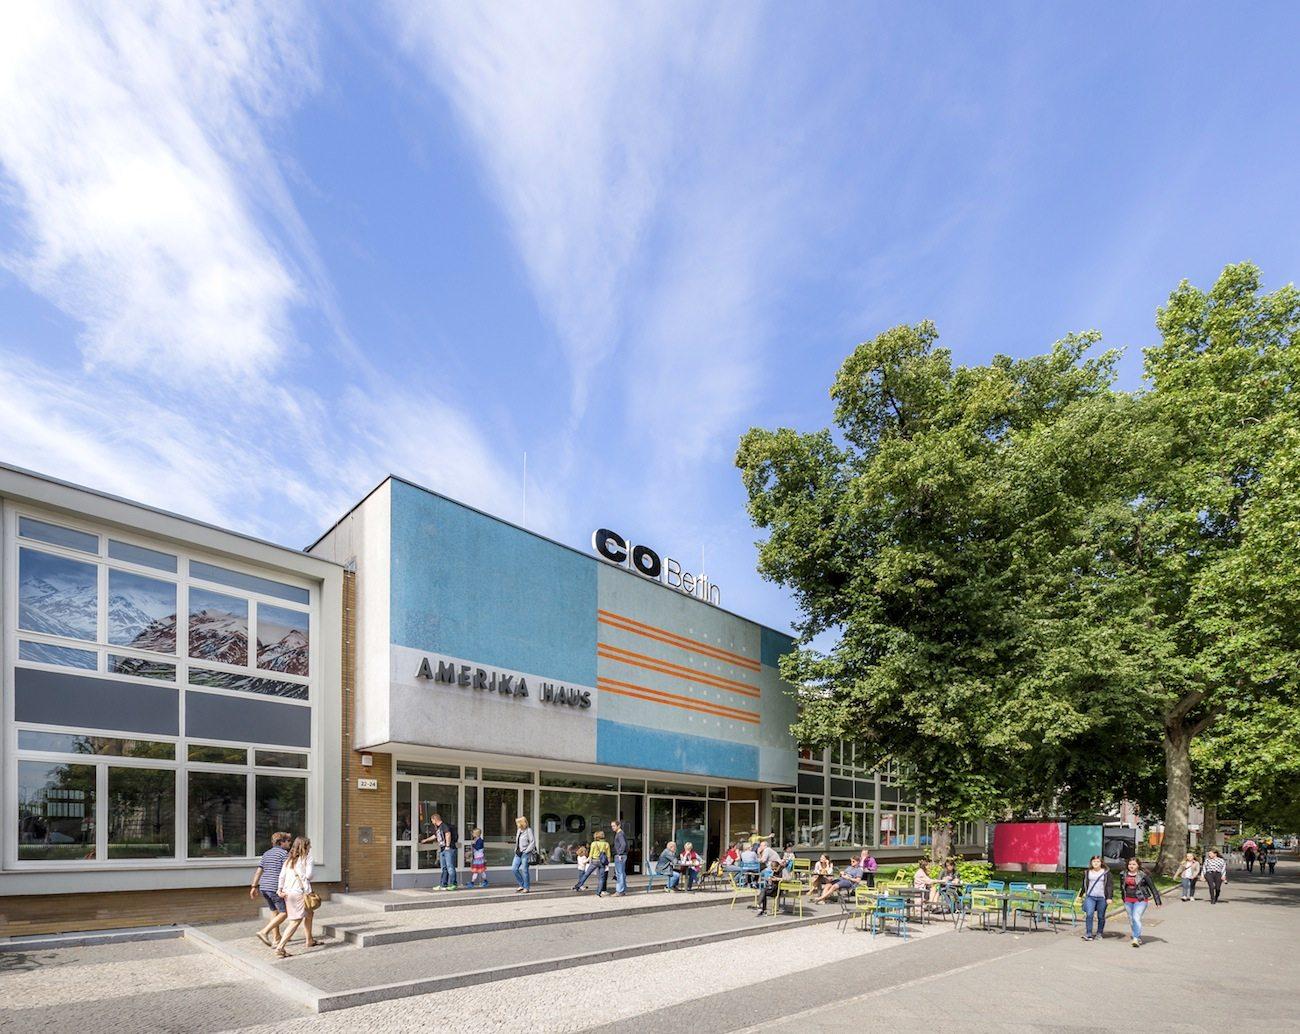 Nachkriegsmoderne. Das C/O Berlin im Amerika Haus in Berlin Charlottenburg